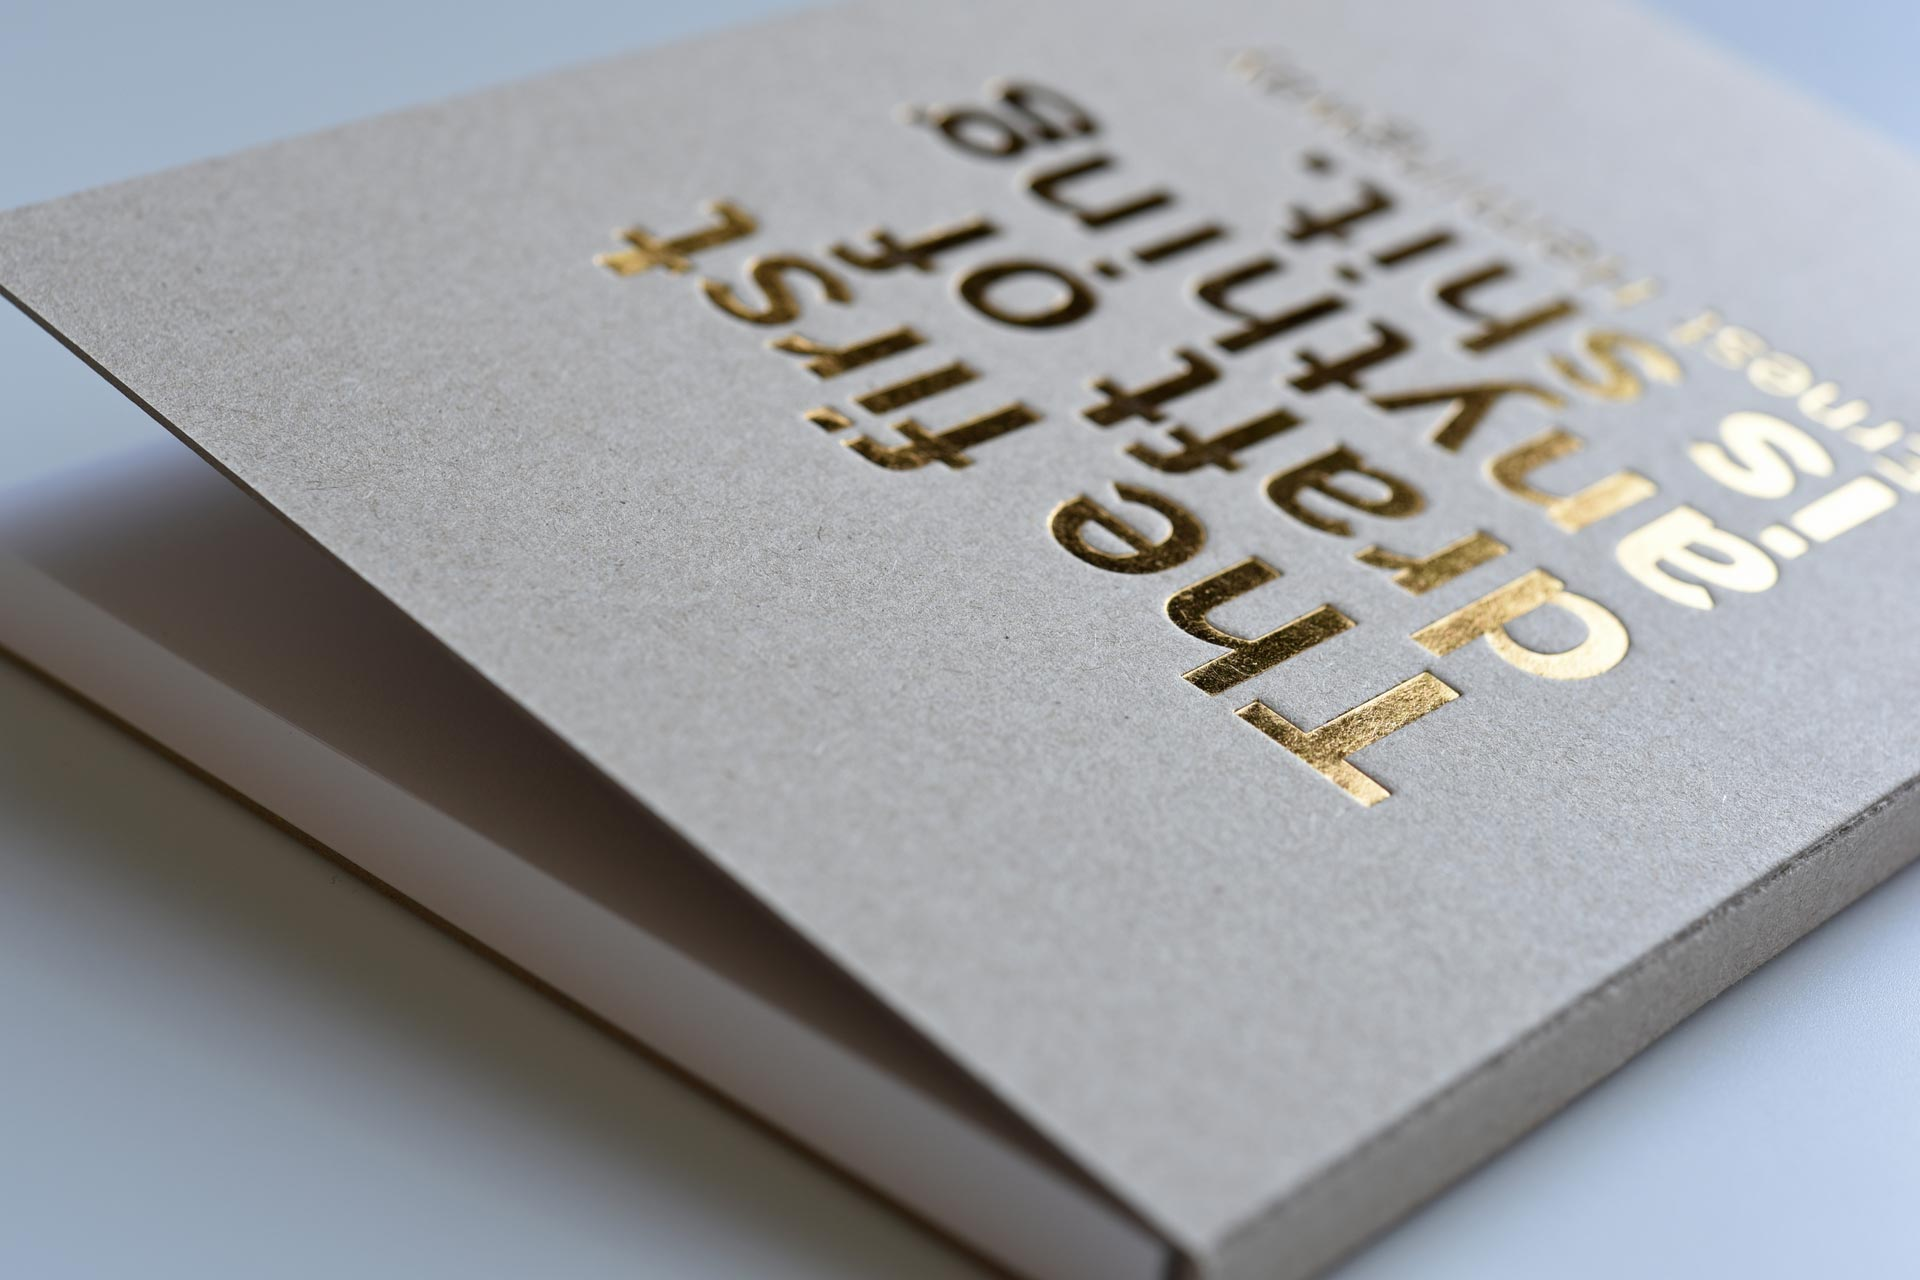 Graukarton Notebooks